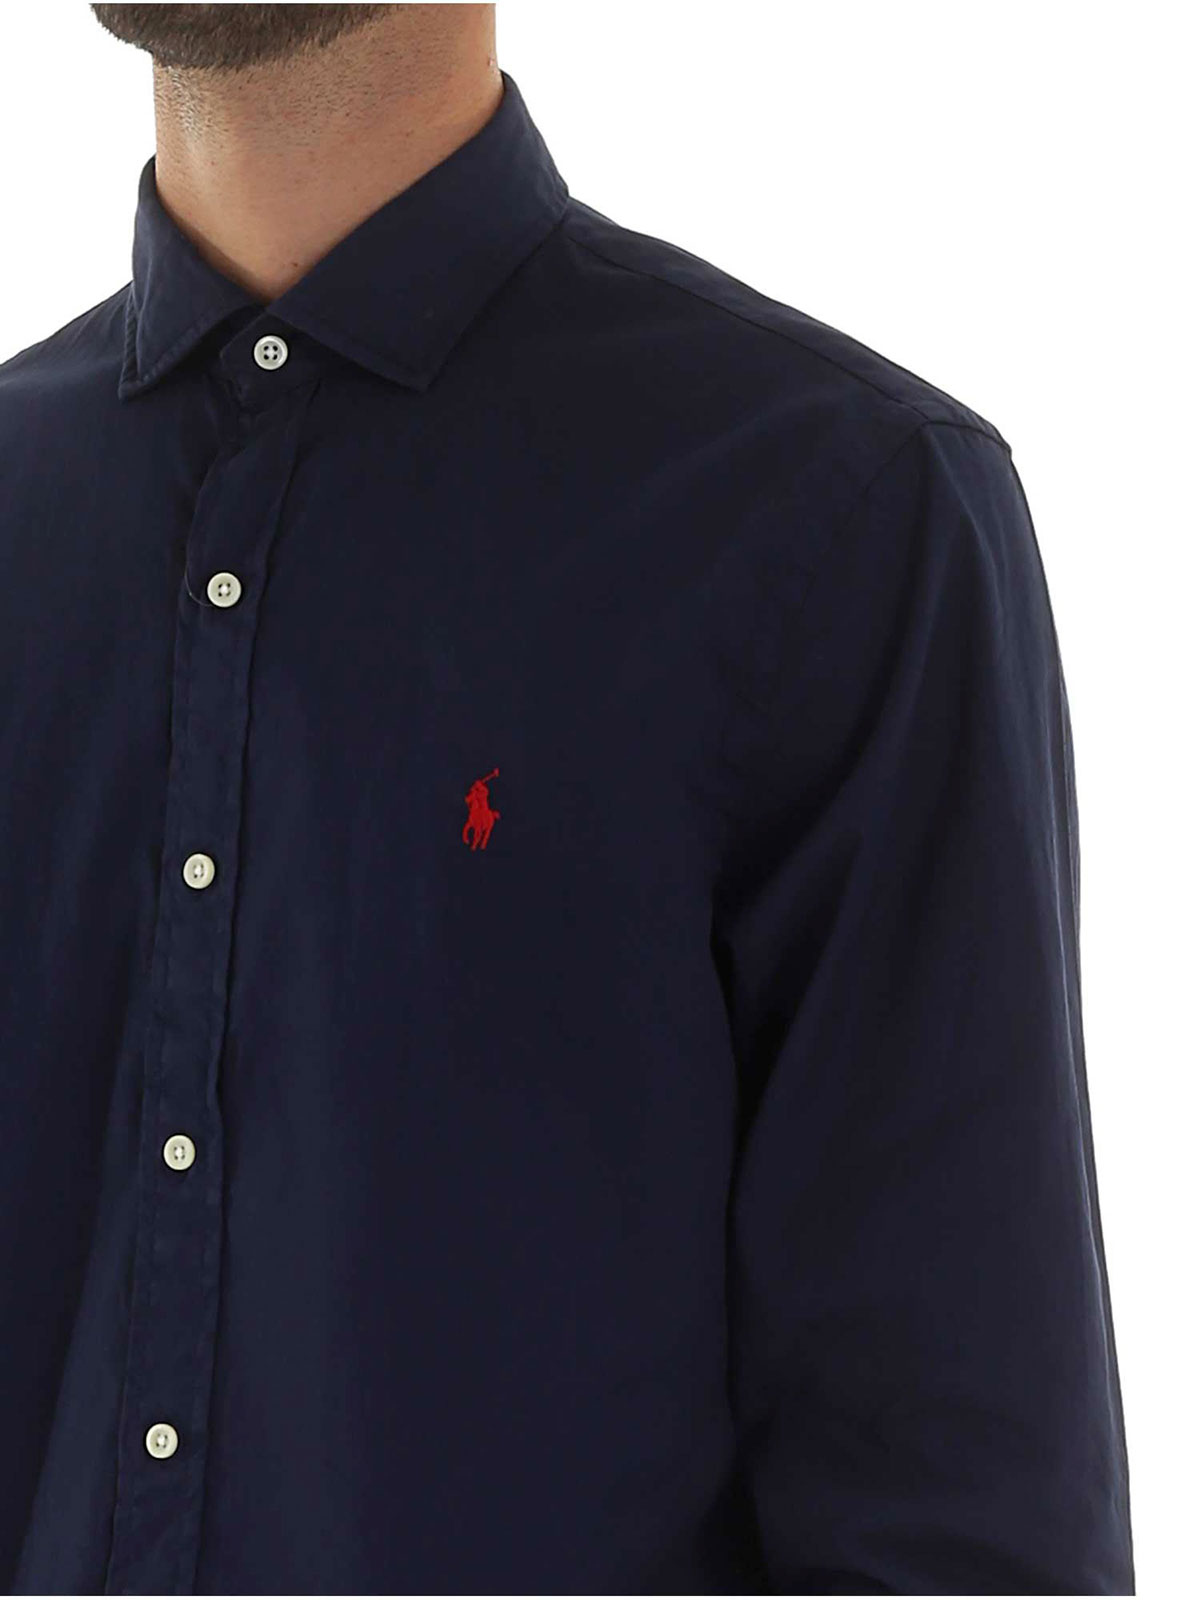 Picture of POLO RALPH LAUREN | Men's Solid Cotton Shirt